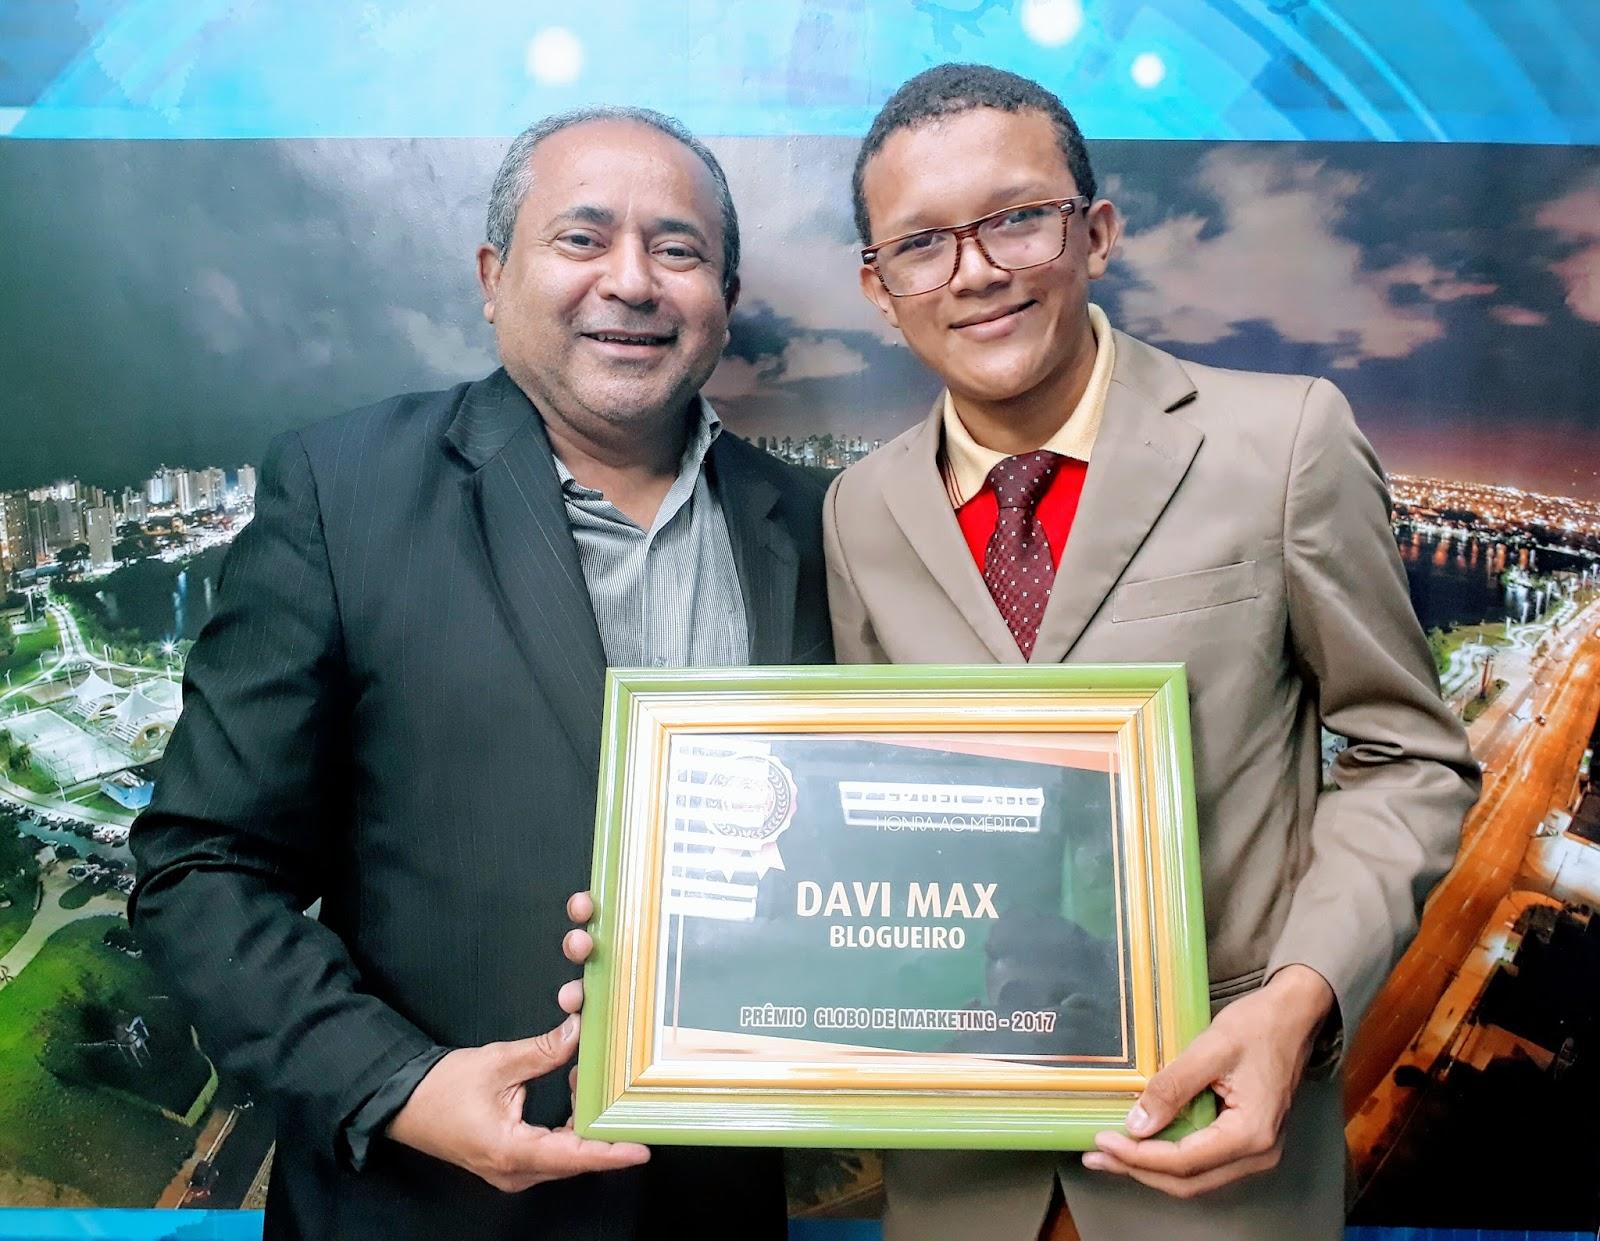 Photo of Jornalista Davi Max recebe prêmio Globo Marketing 2017